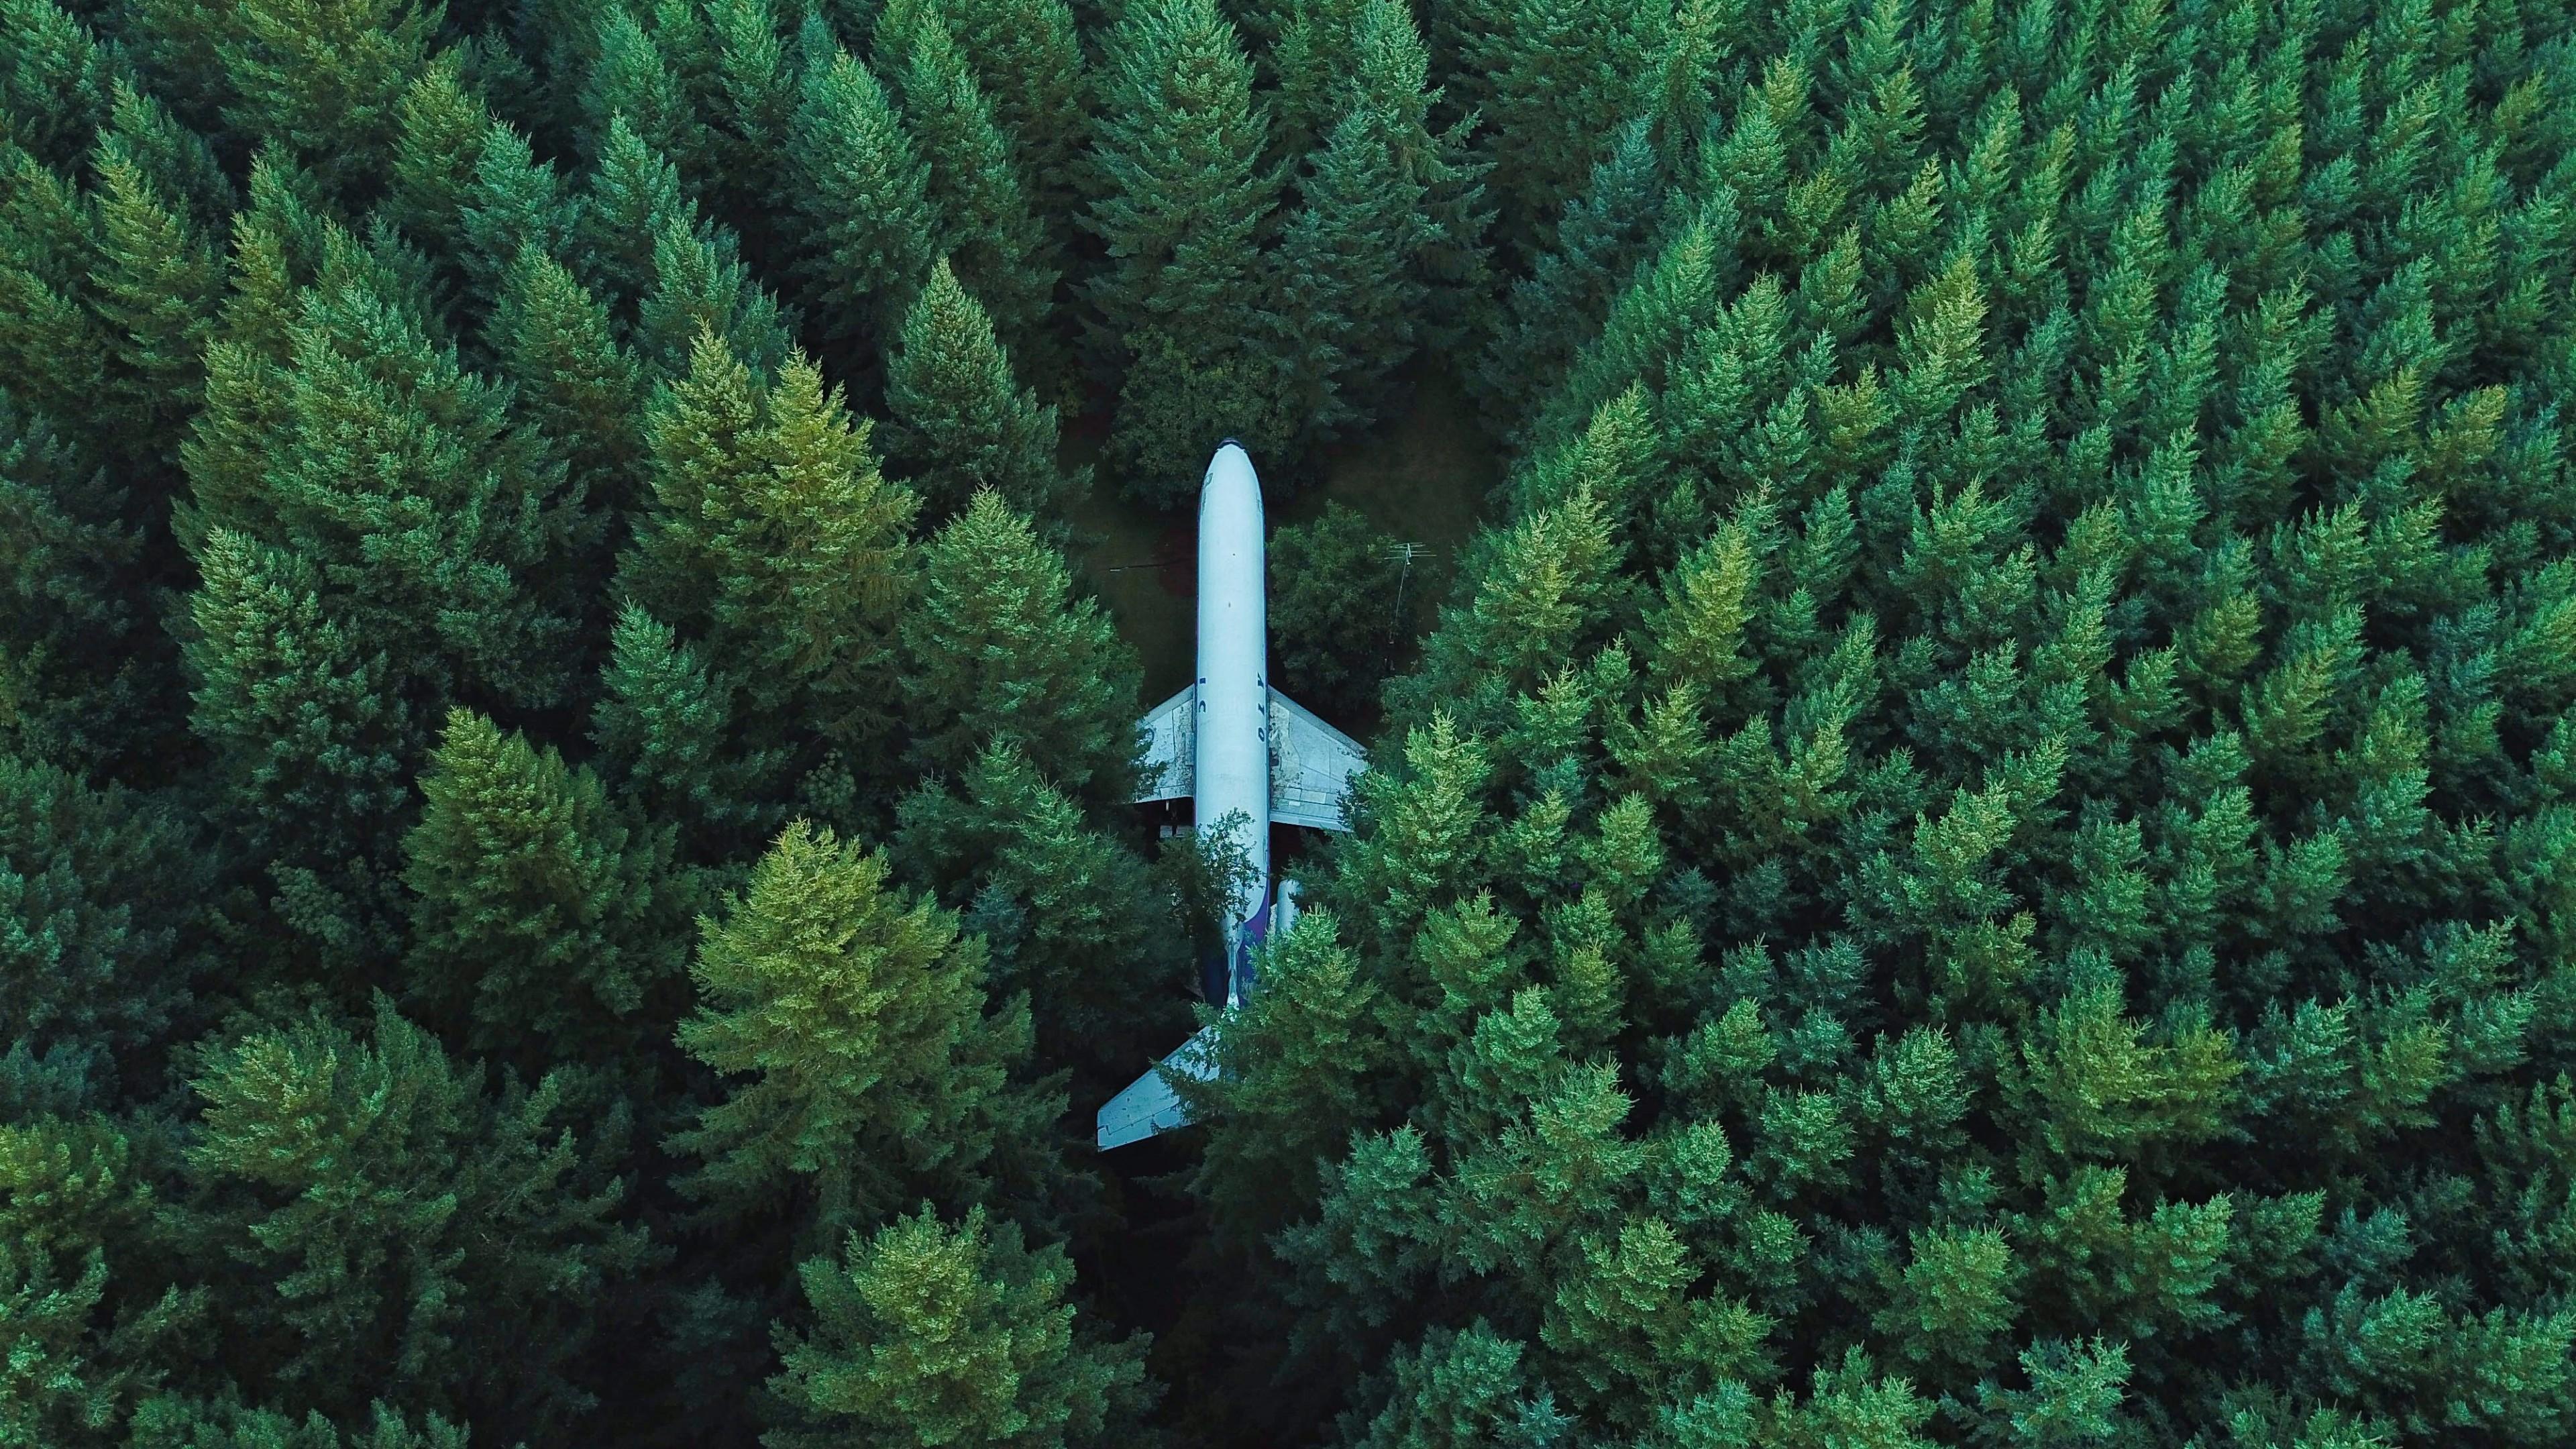 Крылья самолета в пышных хвойных ветках молодых елочек